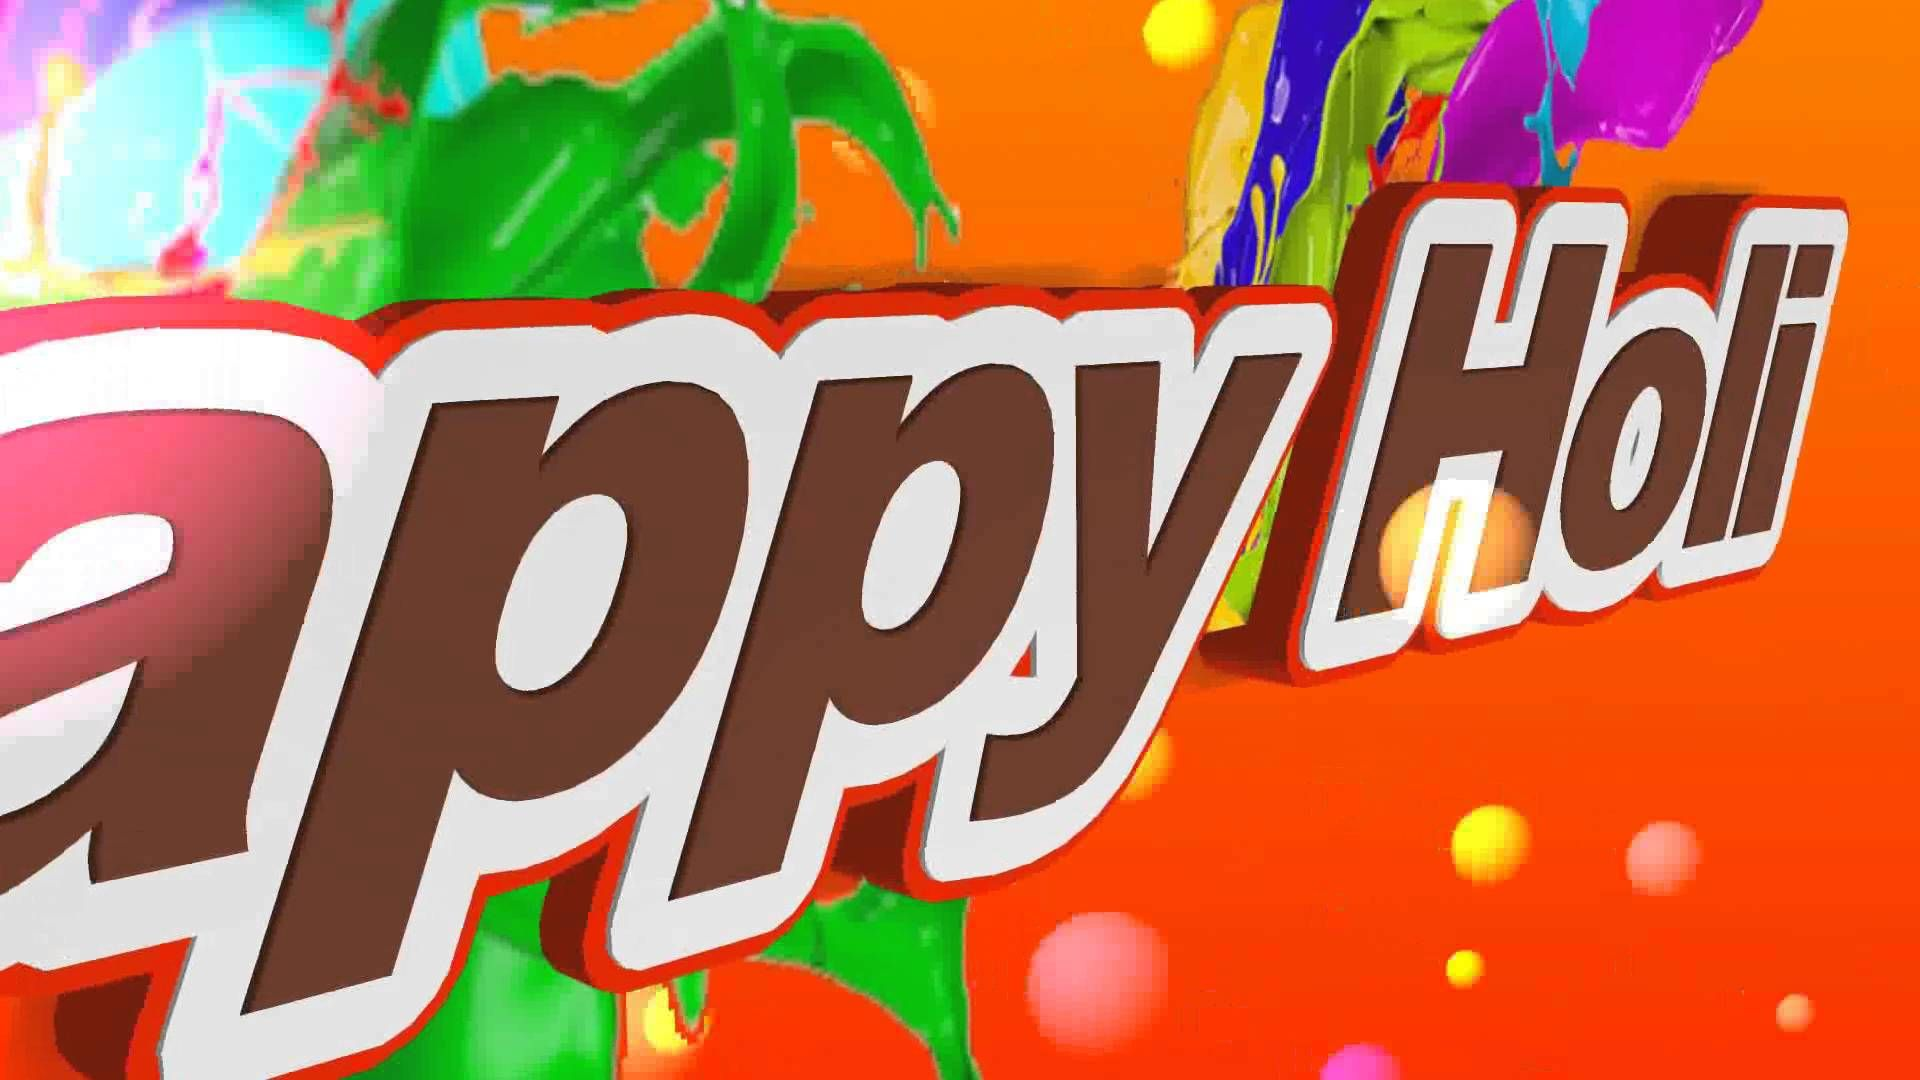 Happy holi animation holi wishes holi whatsapp video holi happy holi animation holi wishes holi whatsapp video holi greetings kristyandbryce Image collections